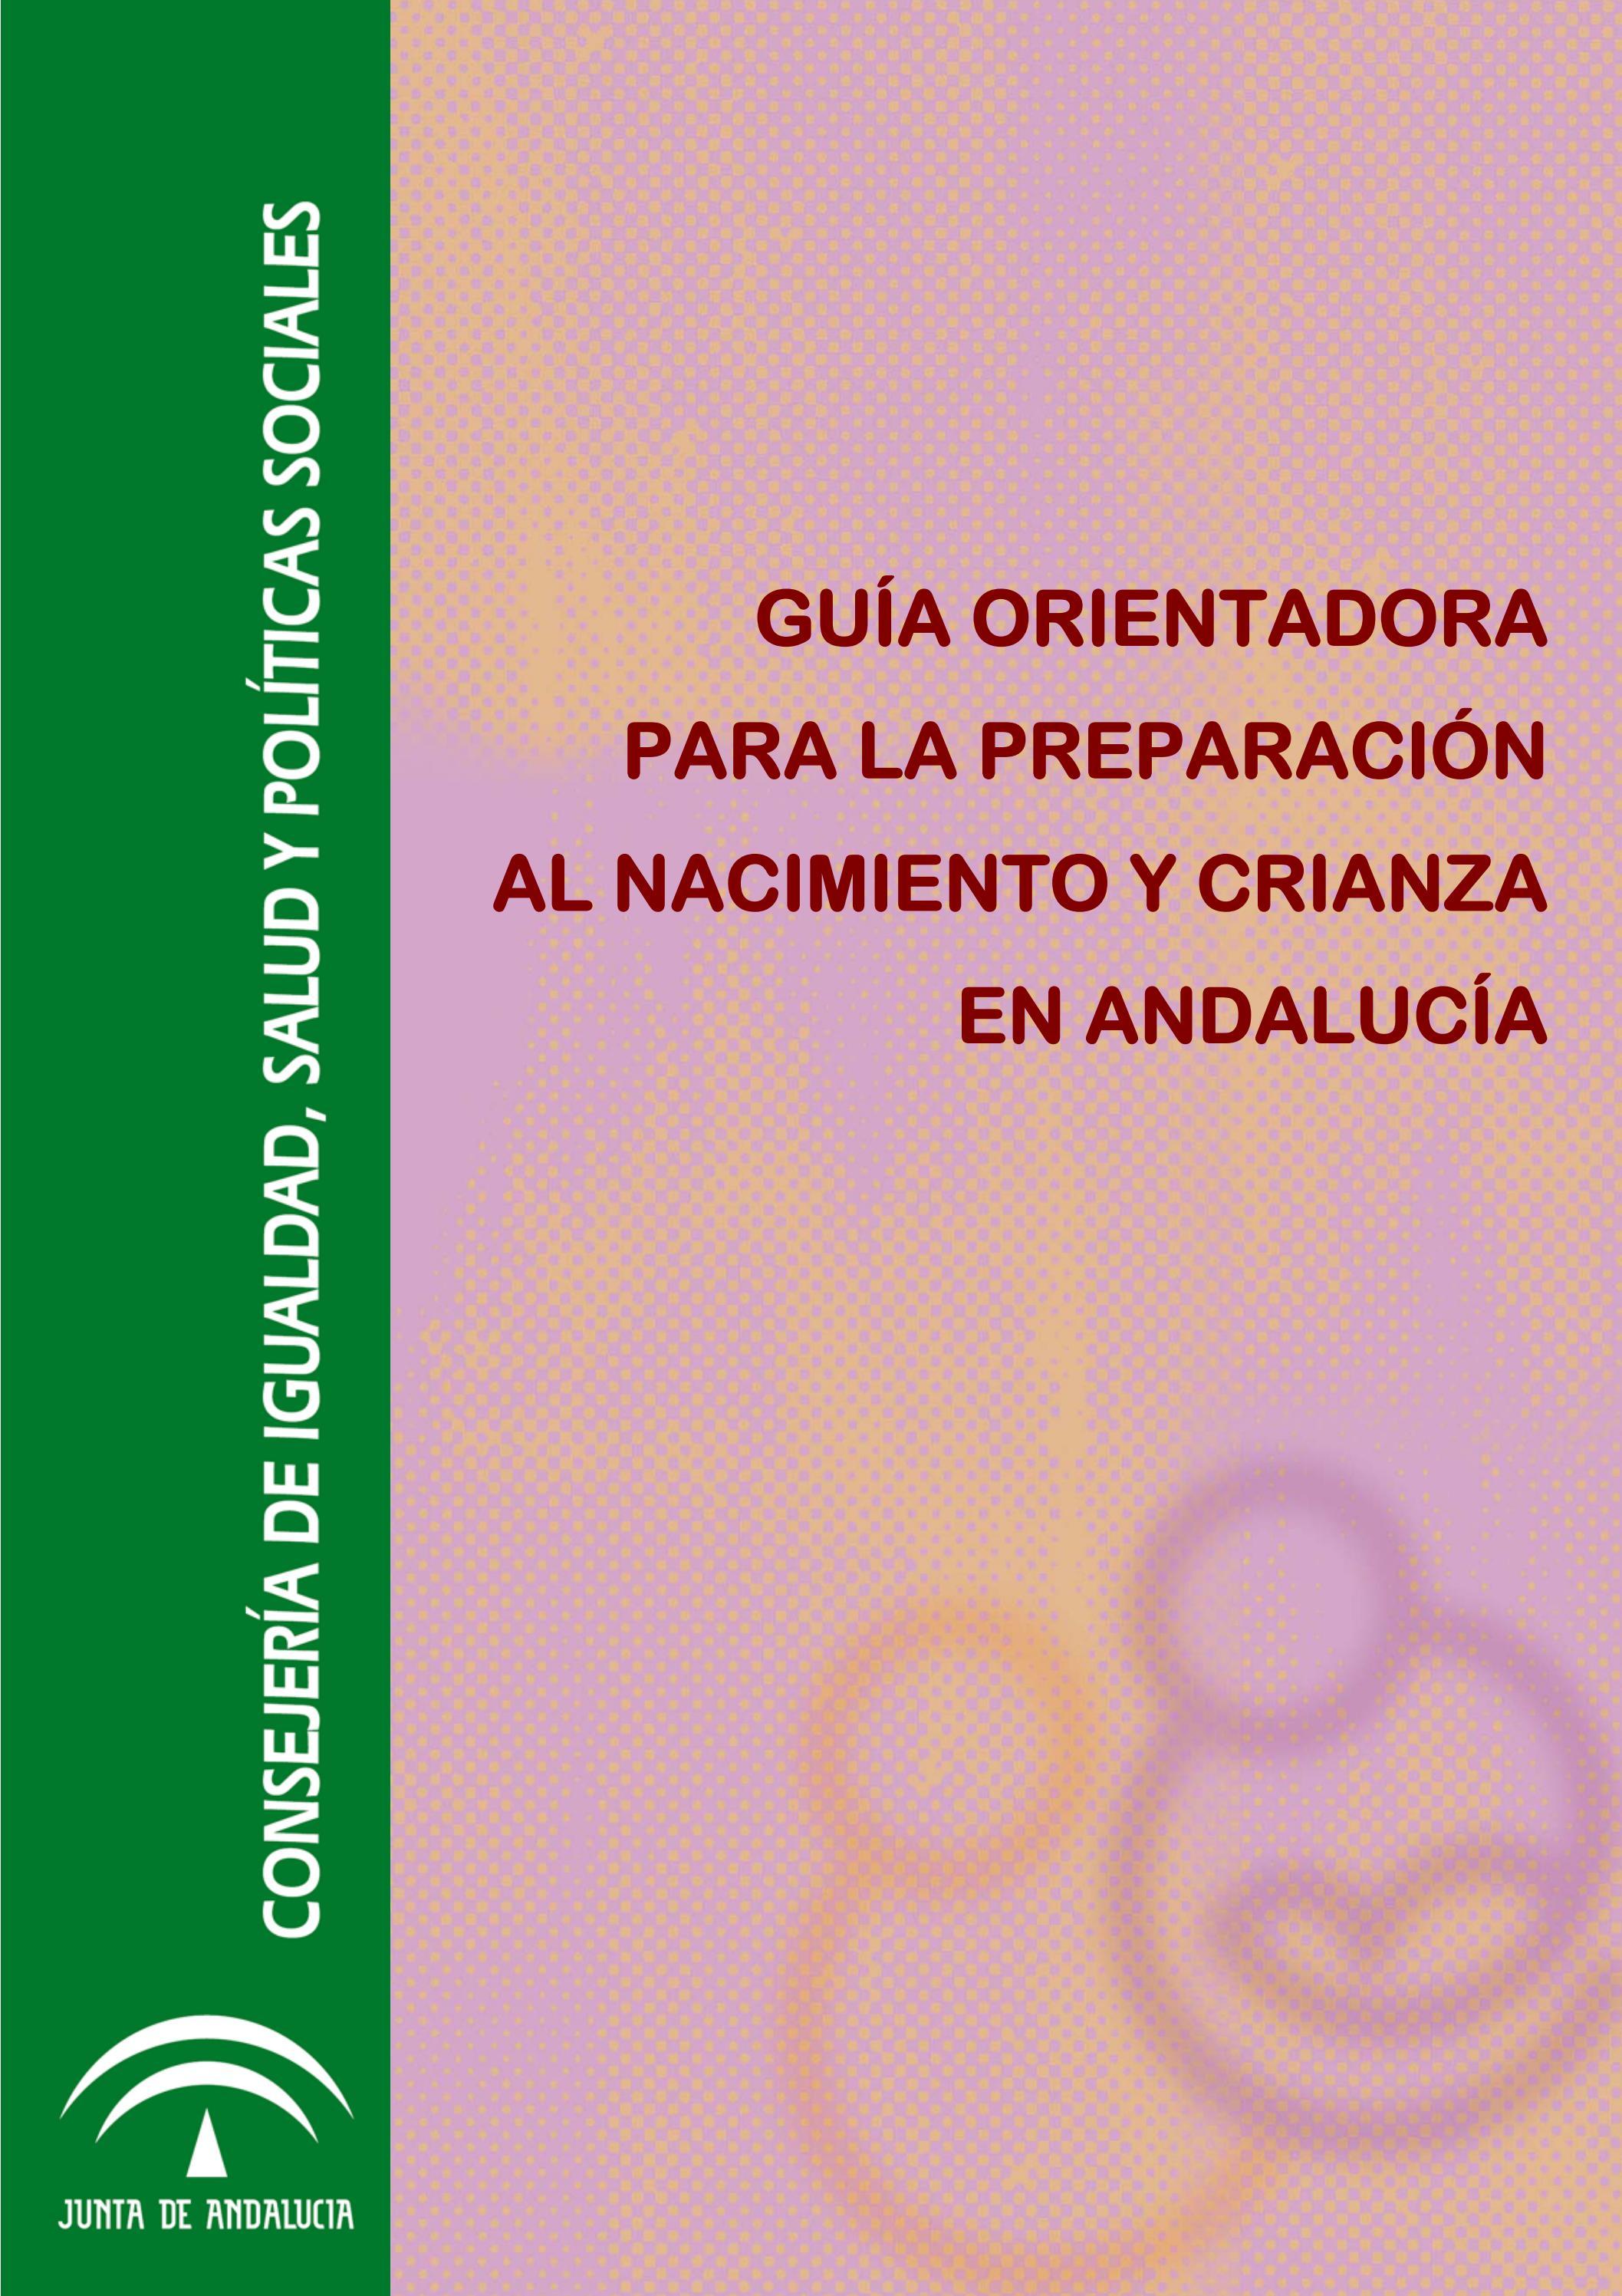 ligadura de trompas seguridad social andalucia